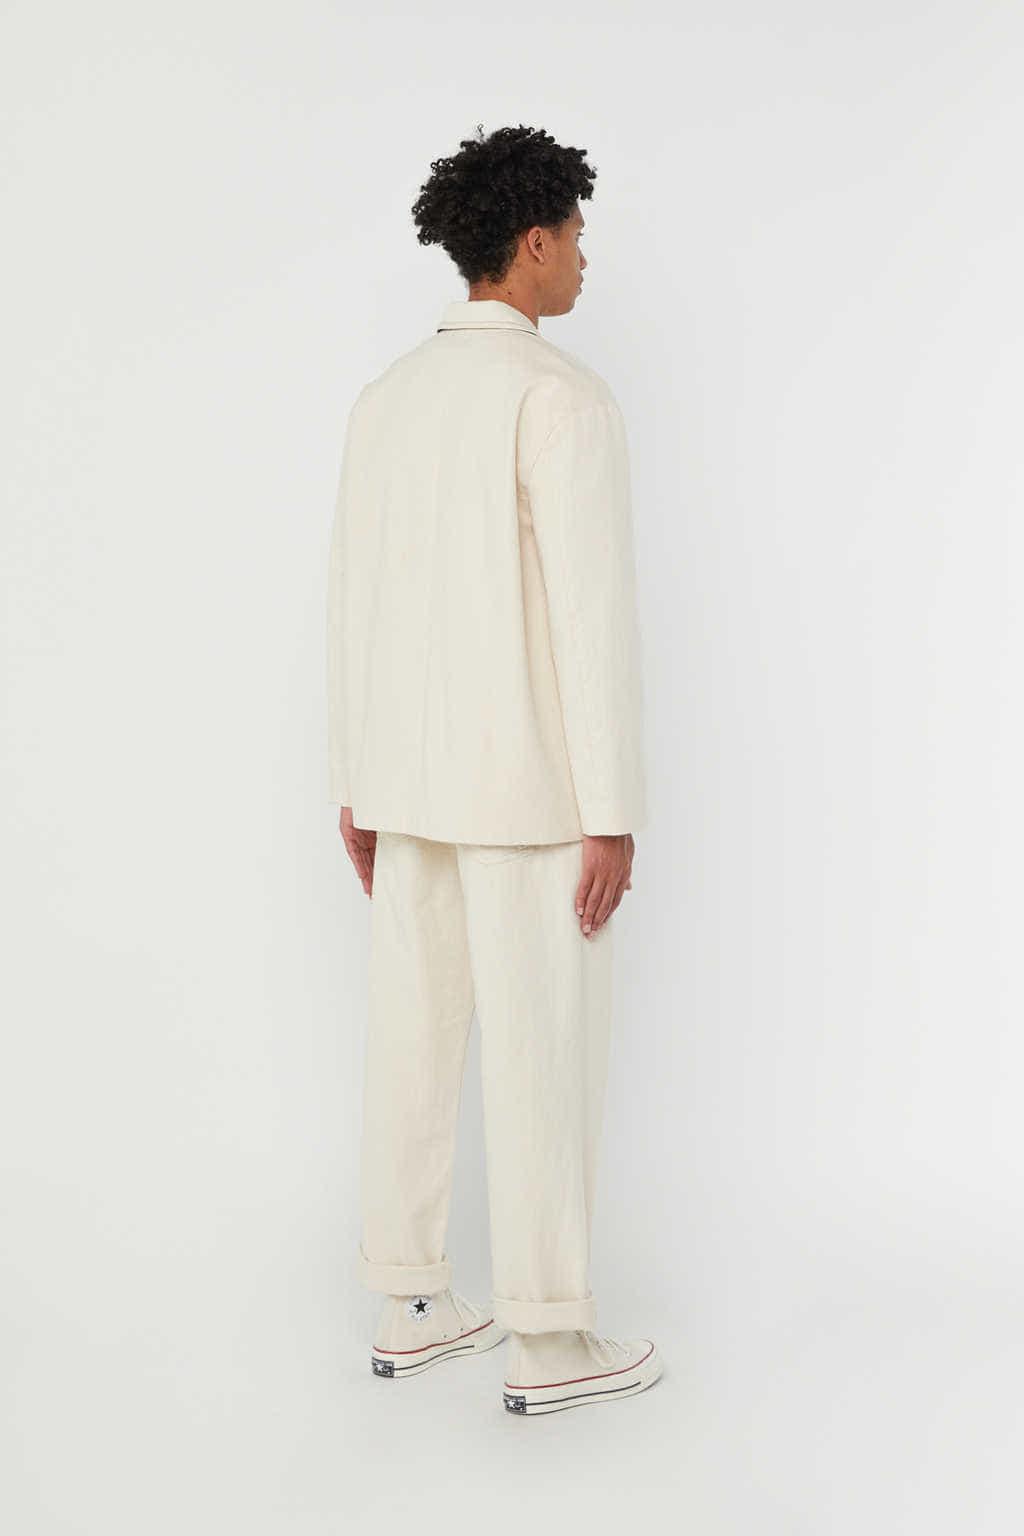 Jacket K002 Cream 4